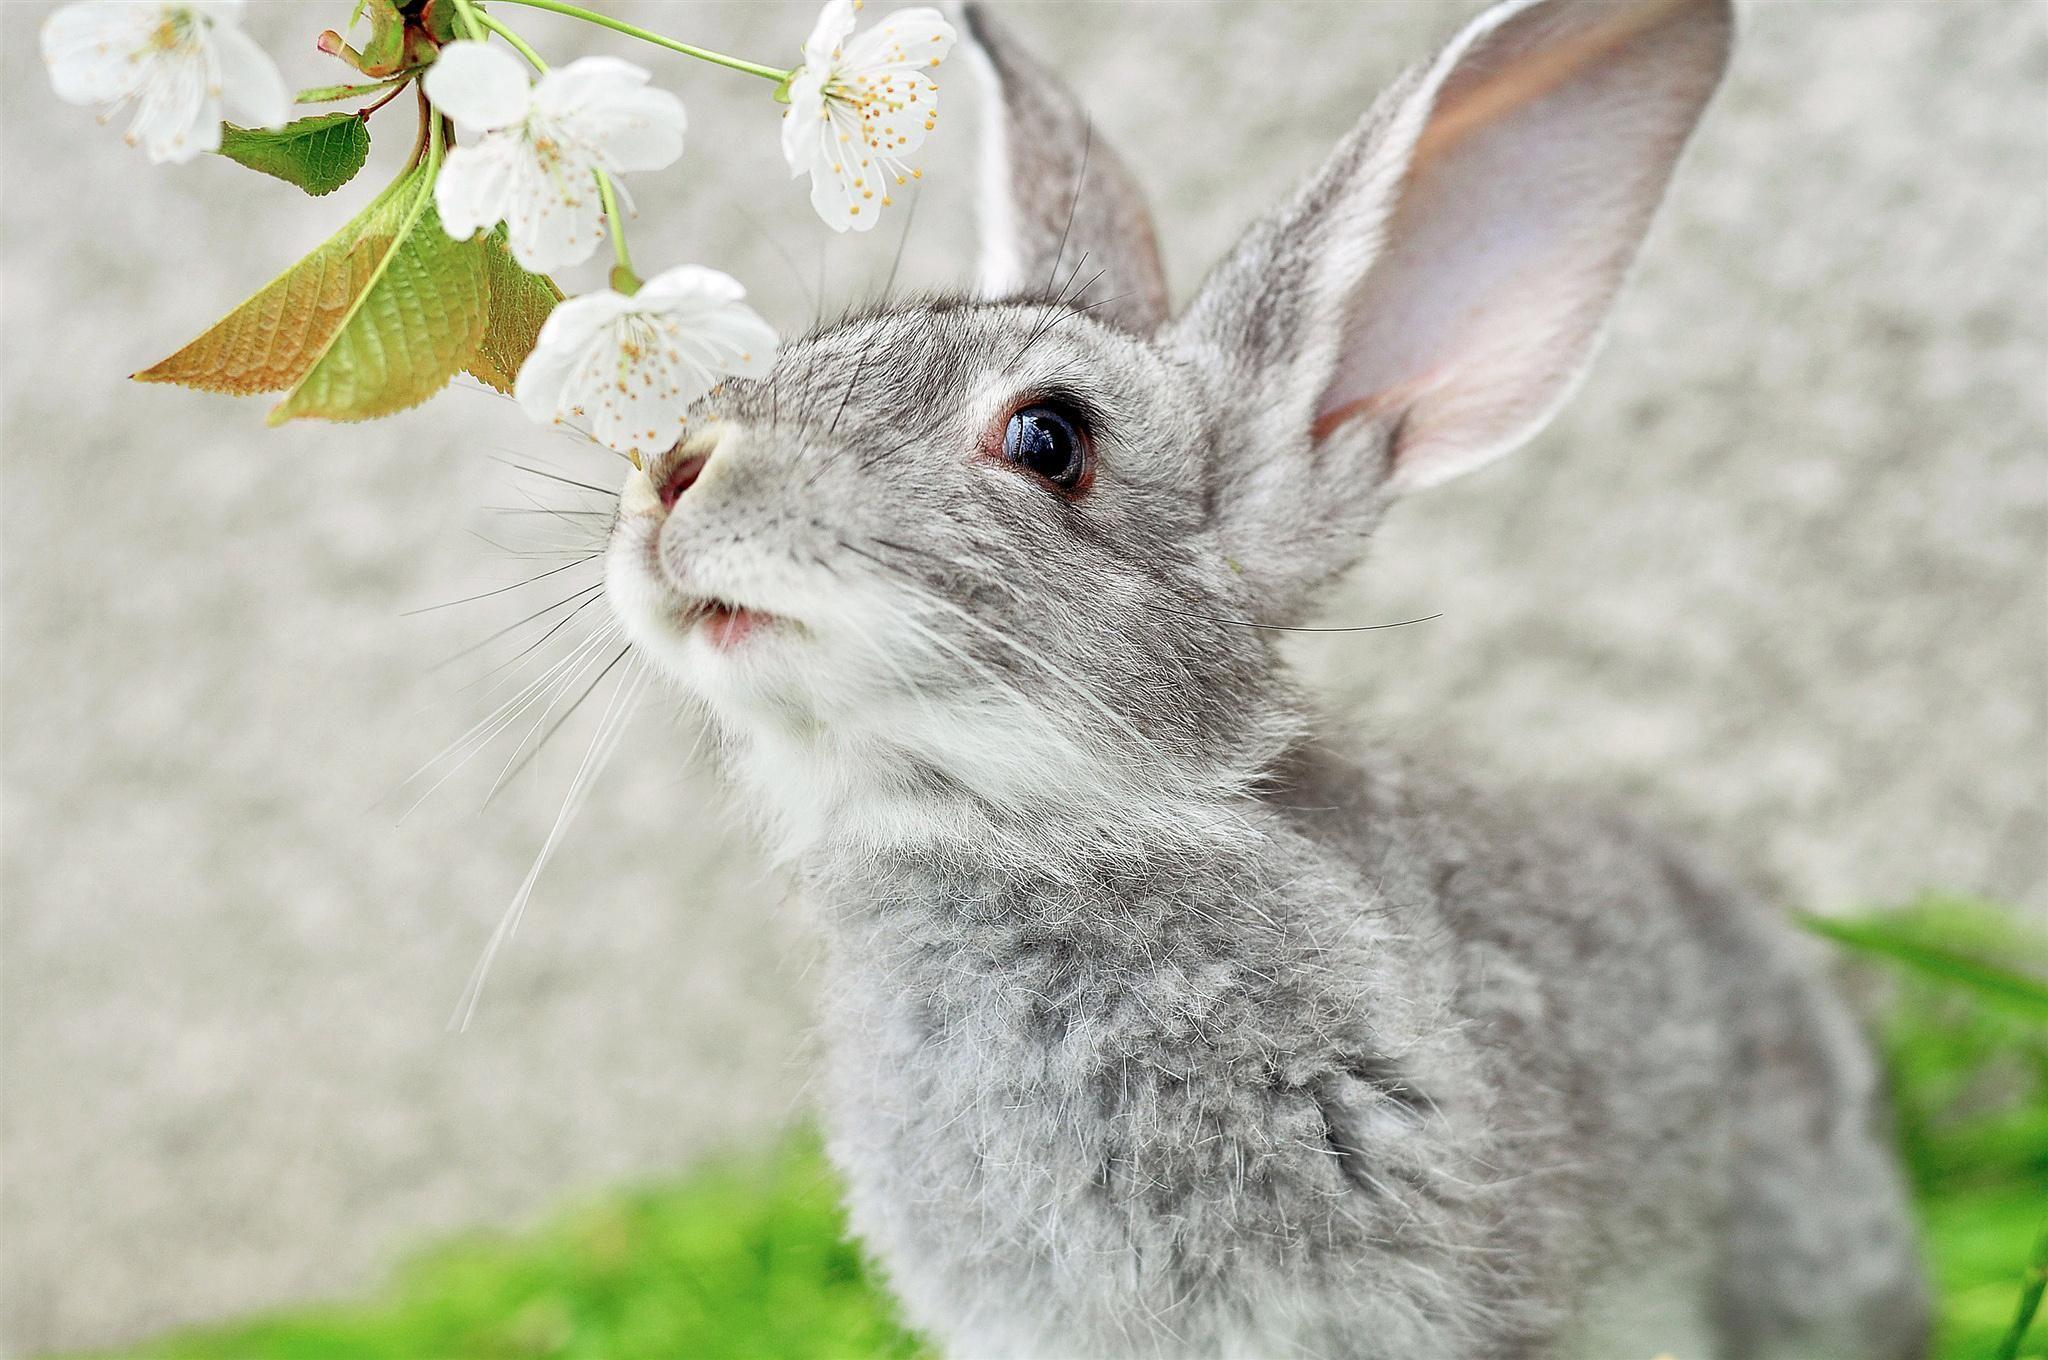 best images about Rabbits on Pinterest Animaux Rabbit